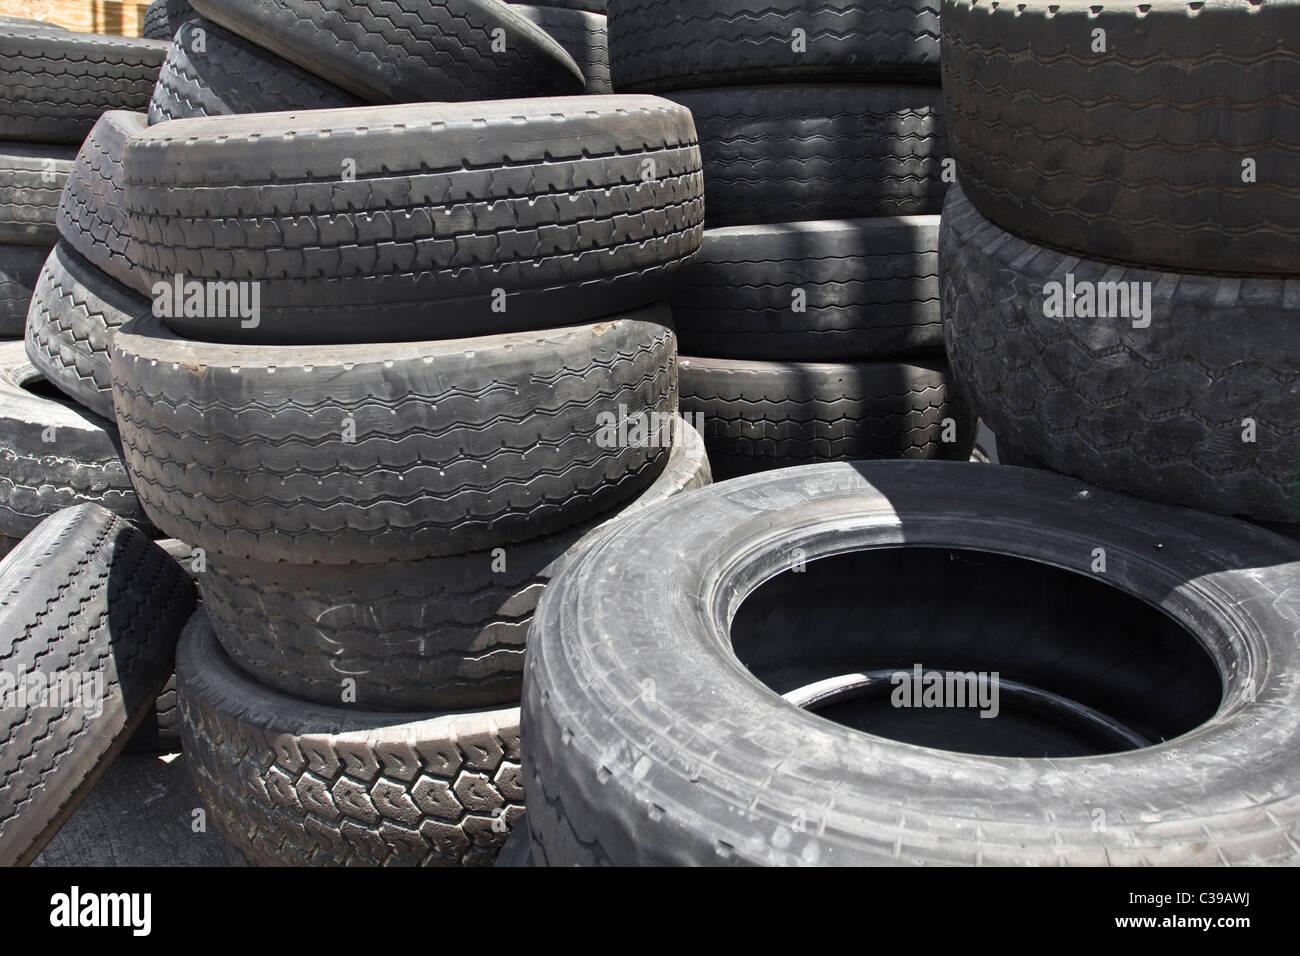 Pile di vecchi pneumatici per camion Immagini Stock